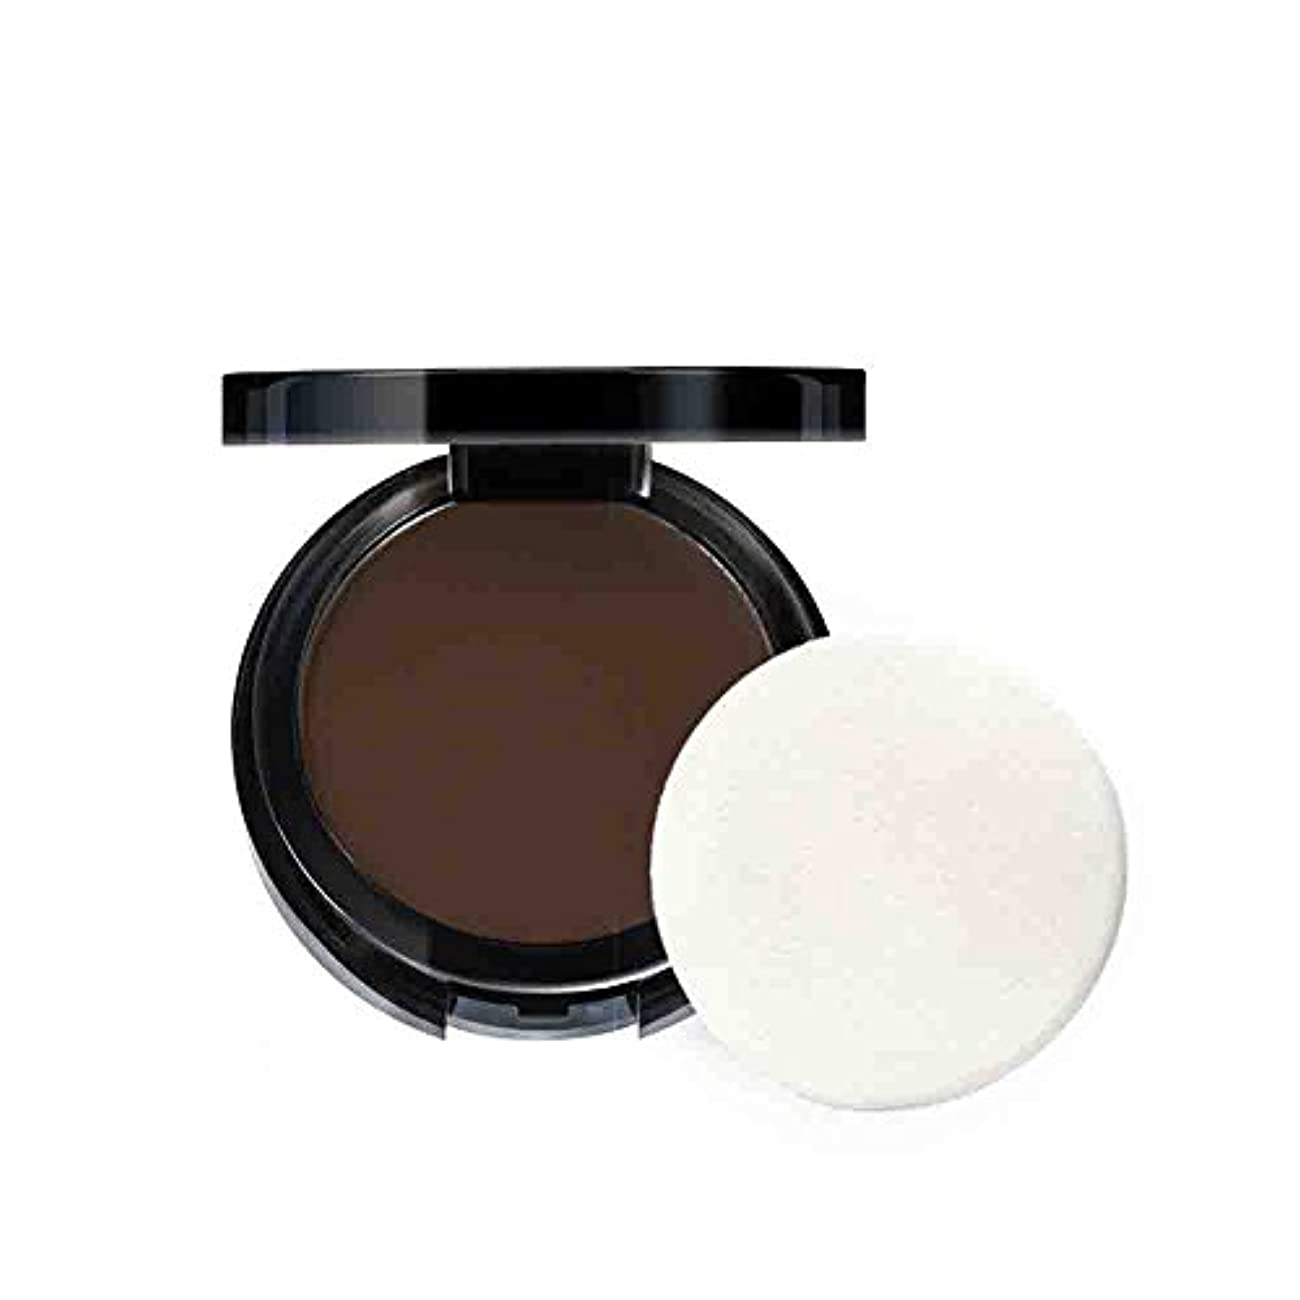 (3 Pack) ABSOLUTE HD Flawless Powder Foundation - Mocha (並行輸入品)